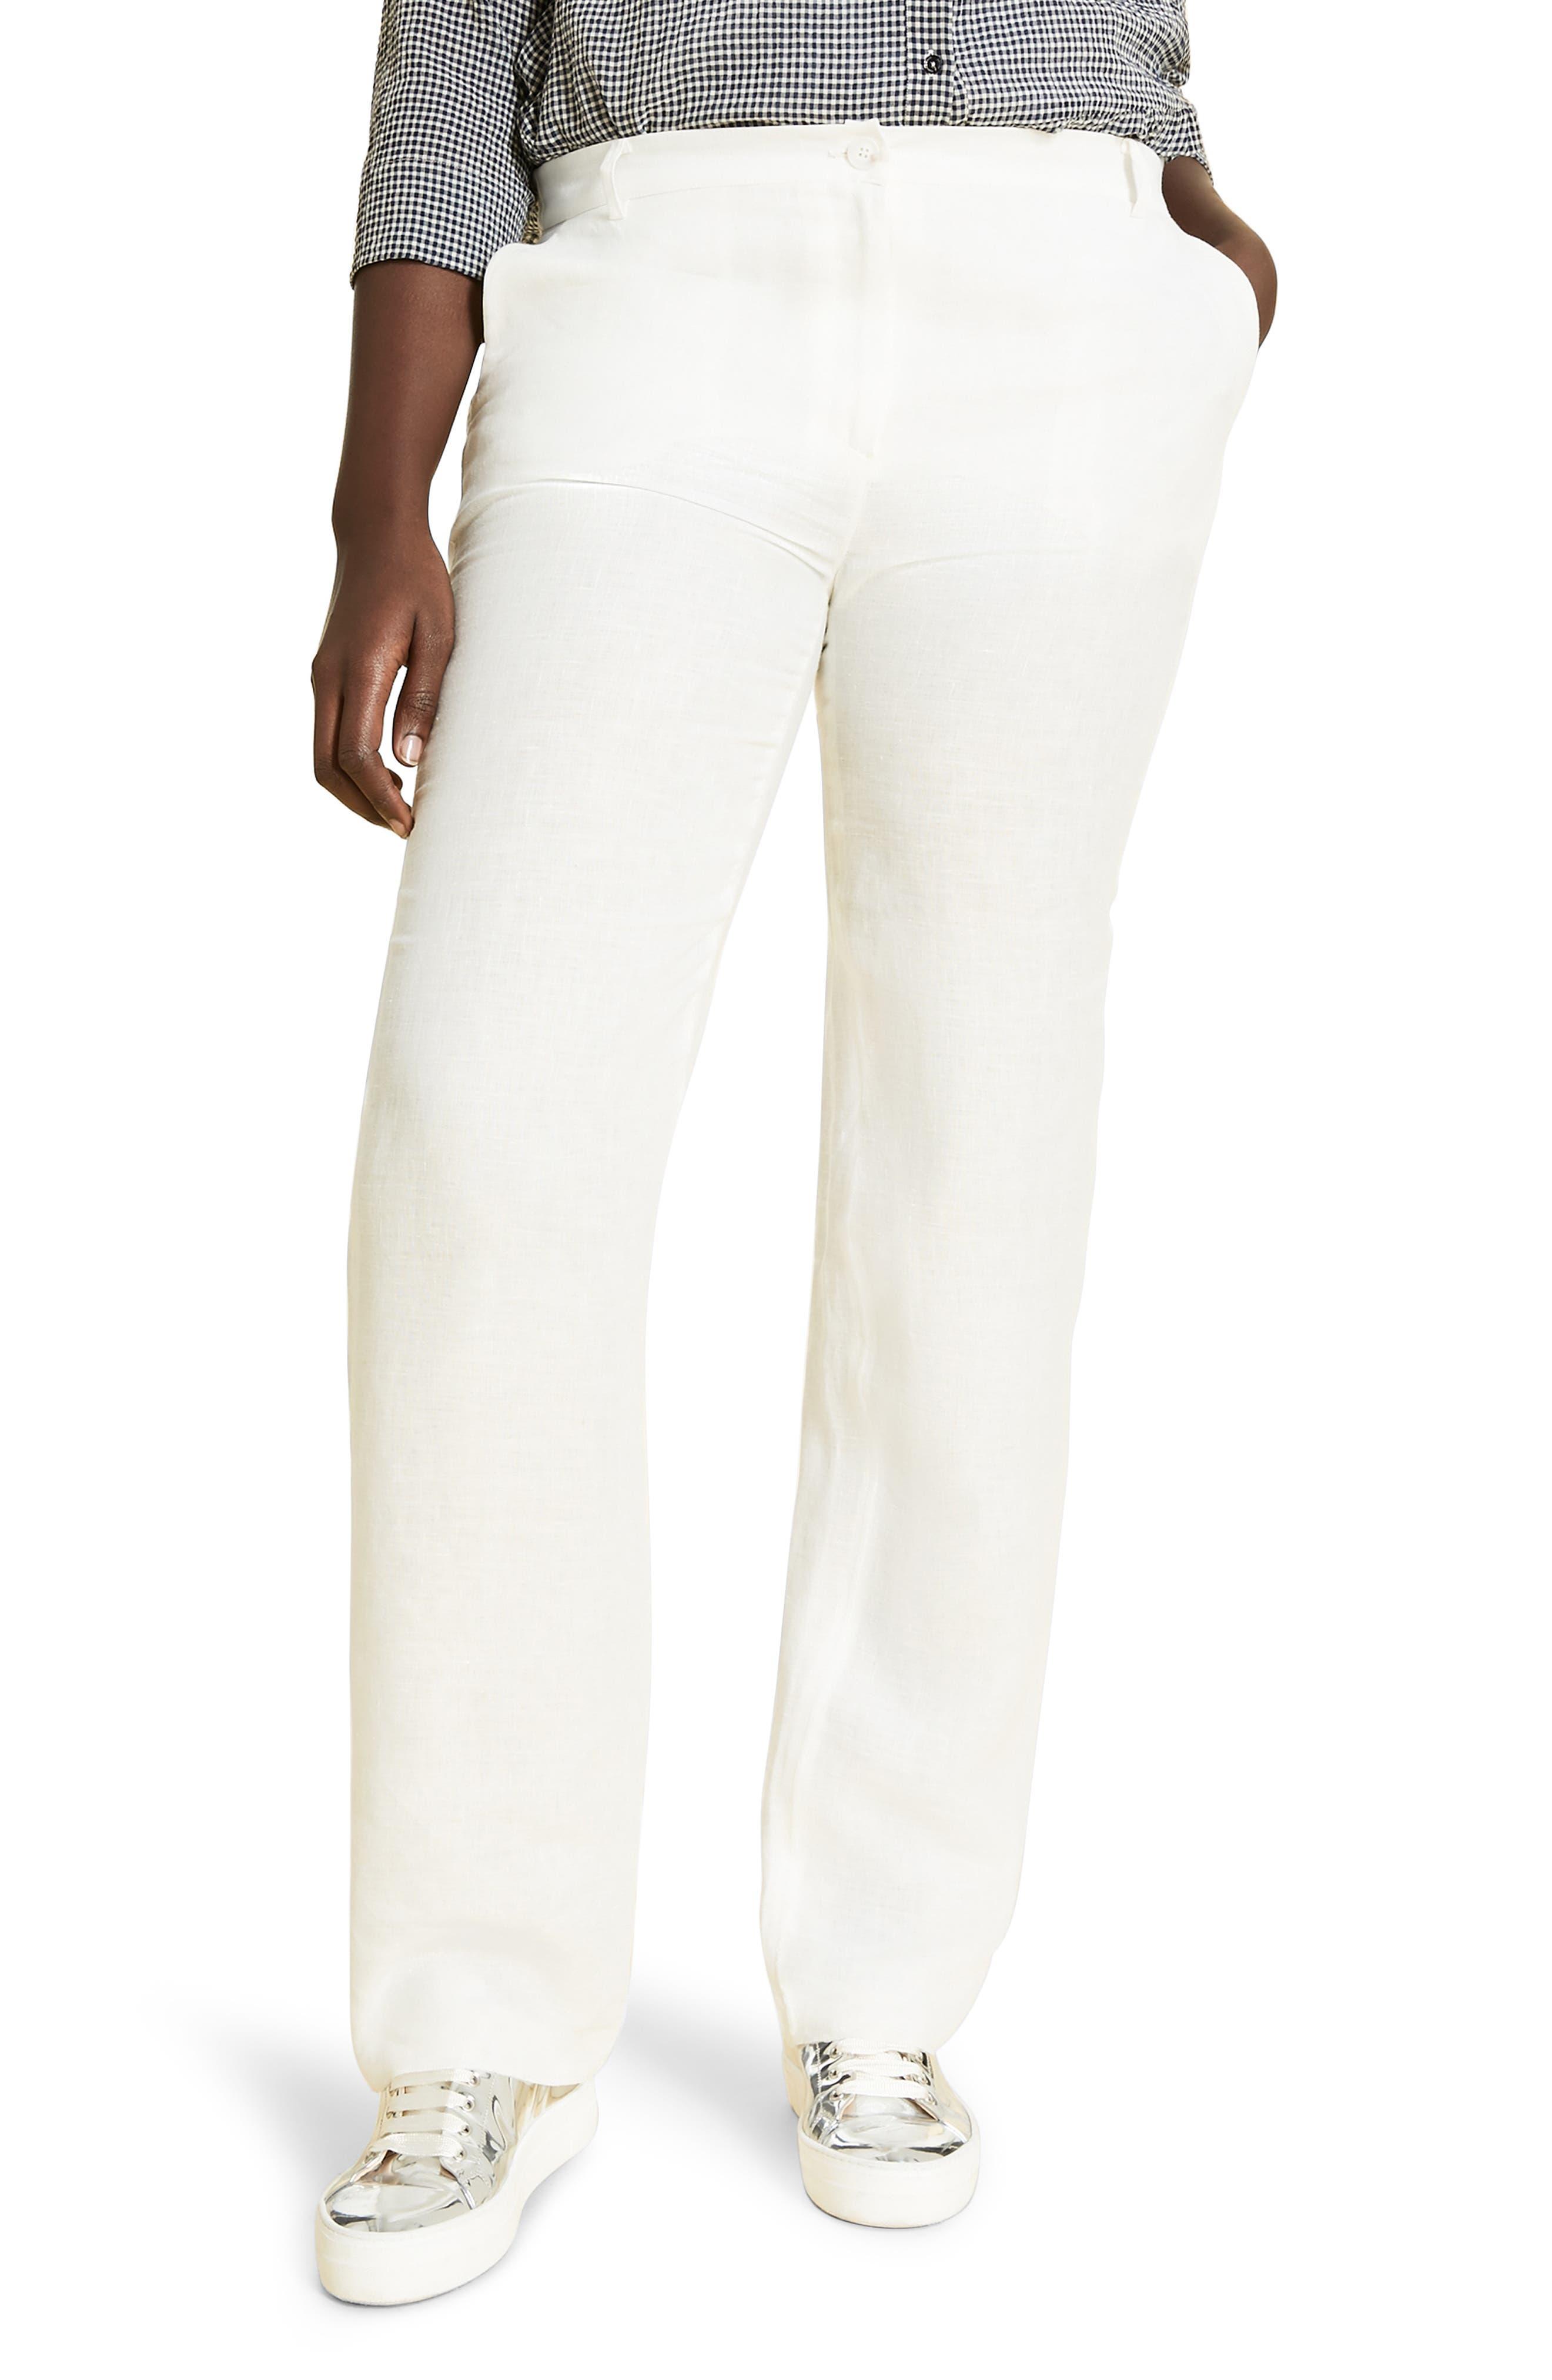 7e33b6442 marina rinaldi trousers pants for women - Buy best women's marina ...